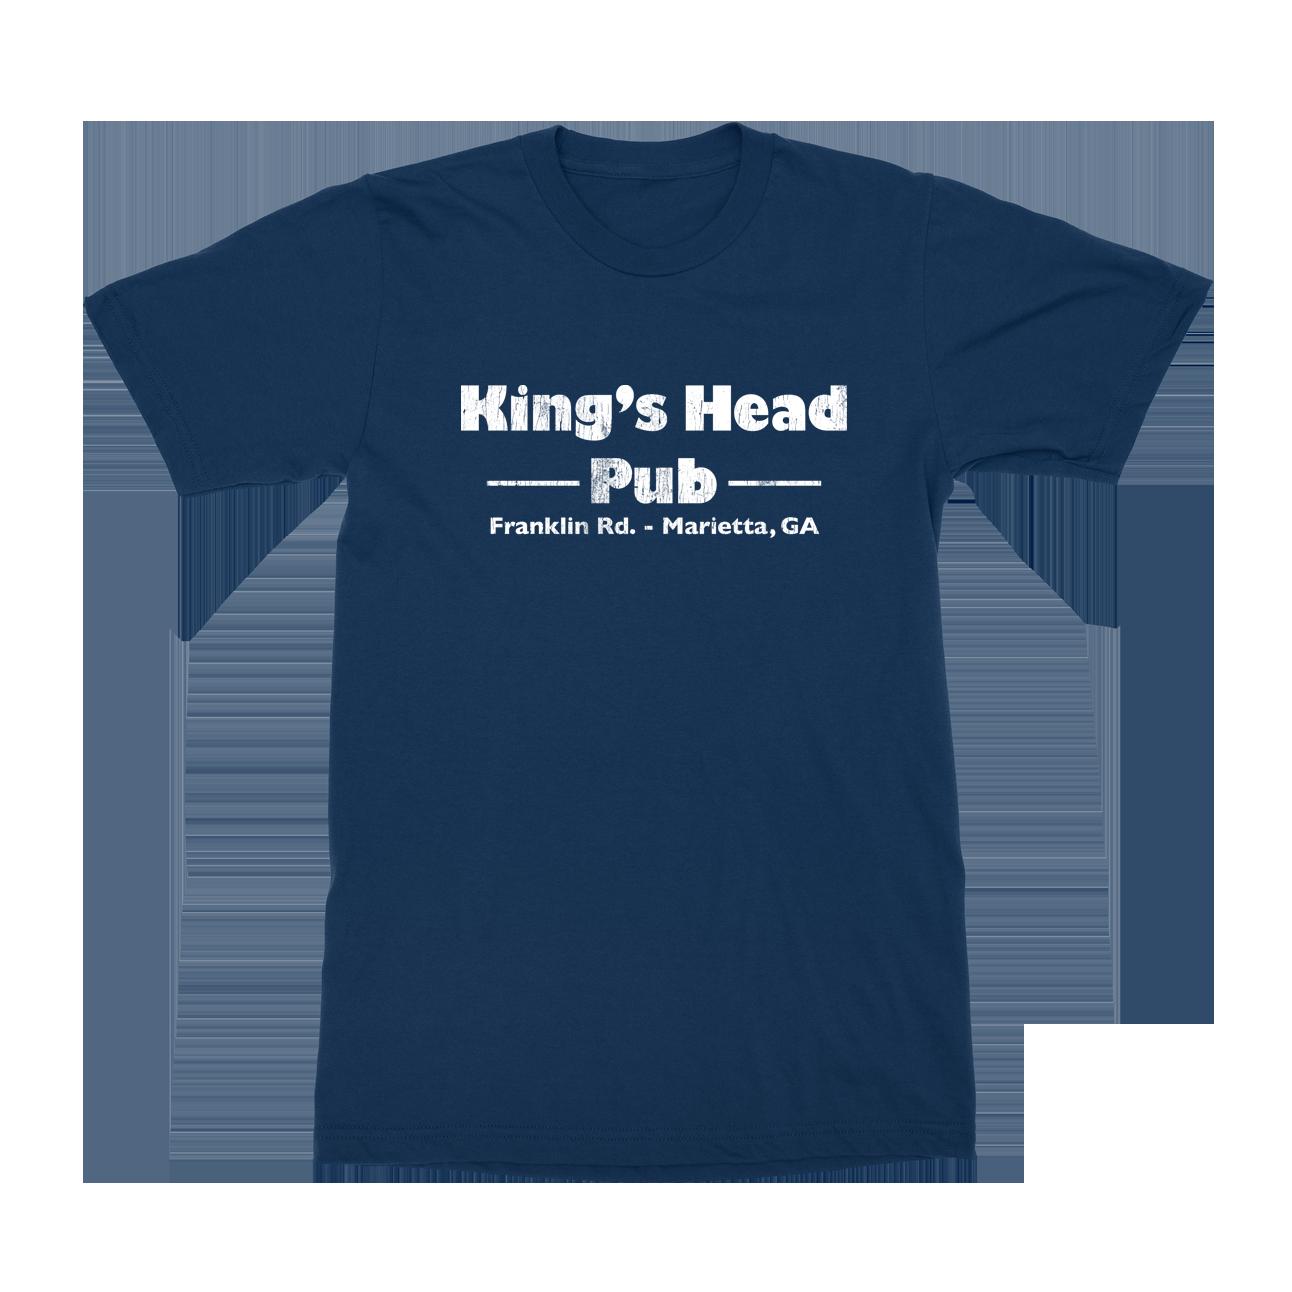 King's Head Pub T-Shirt